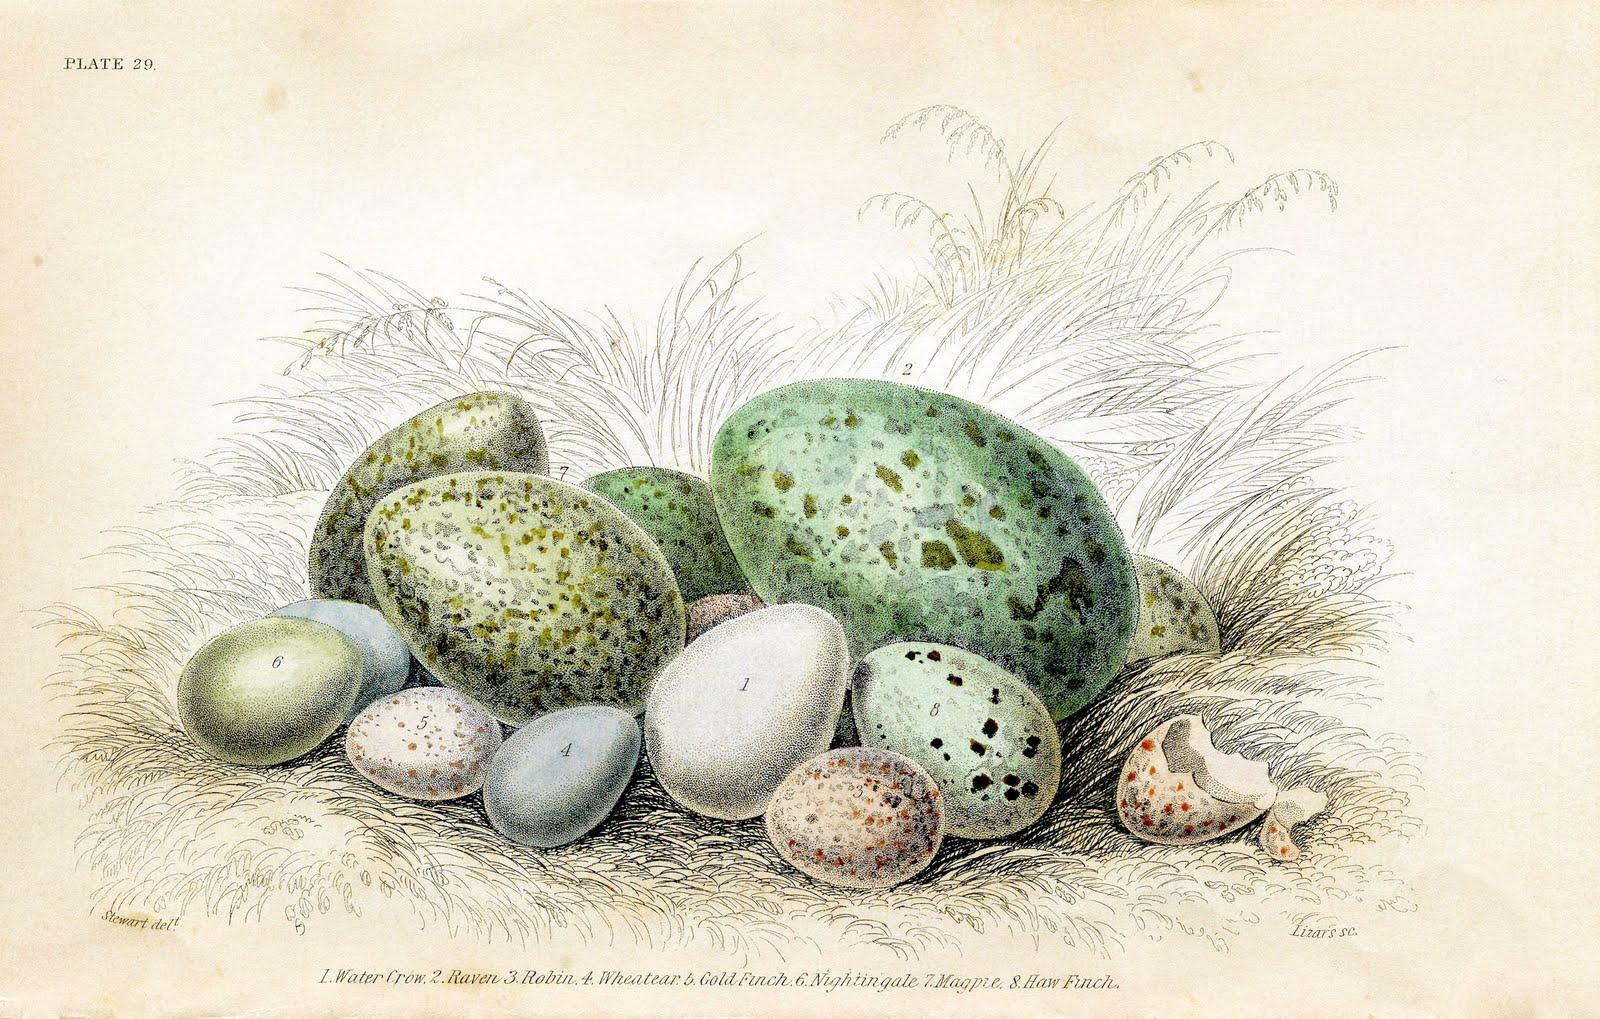 Free Vintage Clip Art - Gorgeous Bird's Eggs - The ...